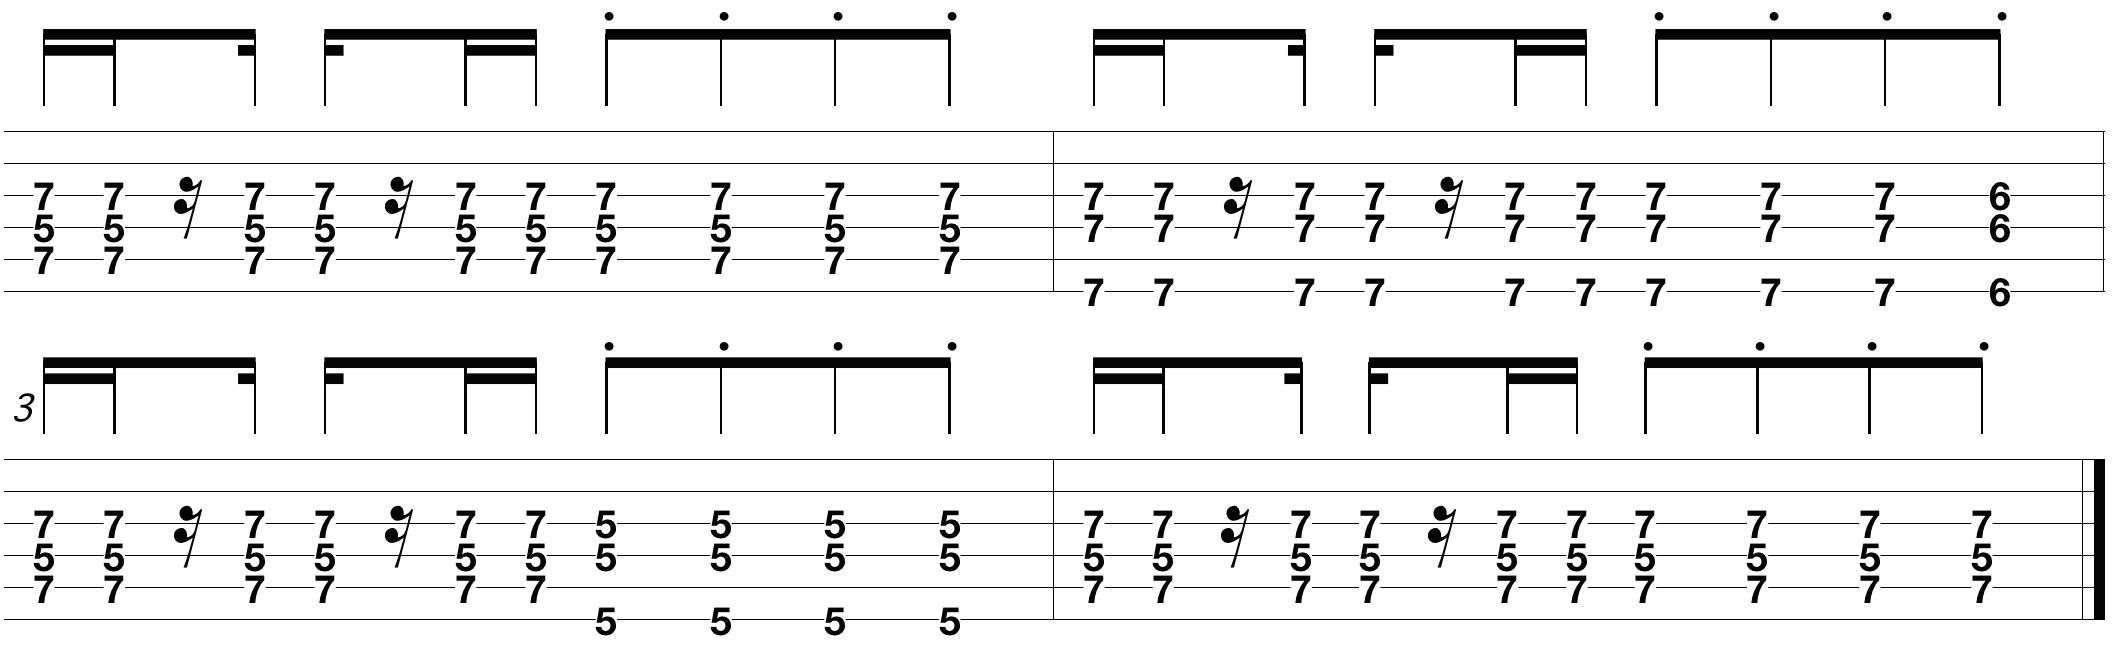 learning-rhythm-guitar_3.png